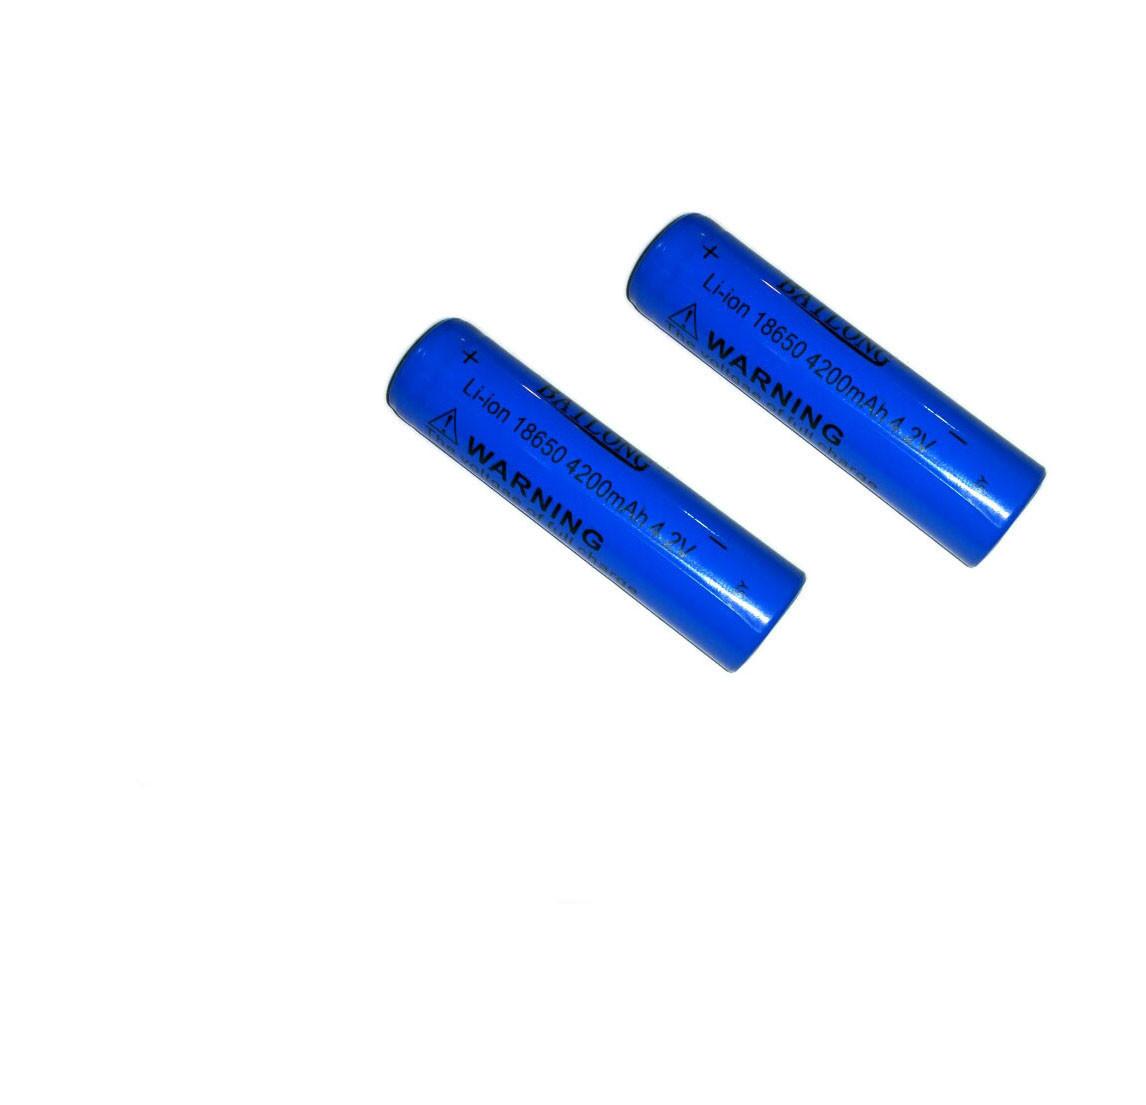 2шт Аккумулятор Li-Ion Bilong 4.2V 18650 4200 New